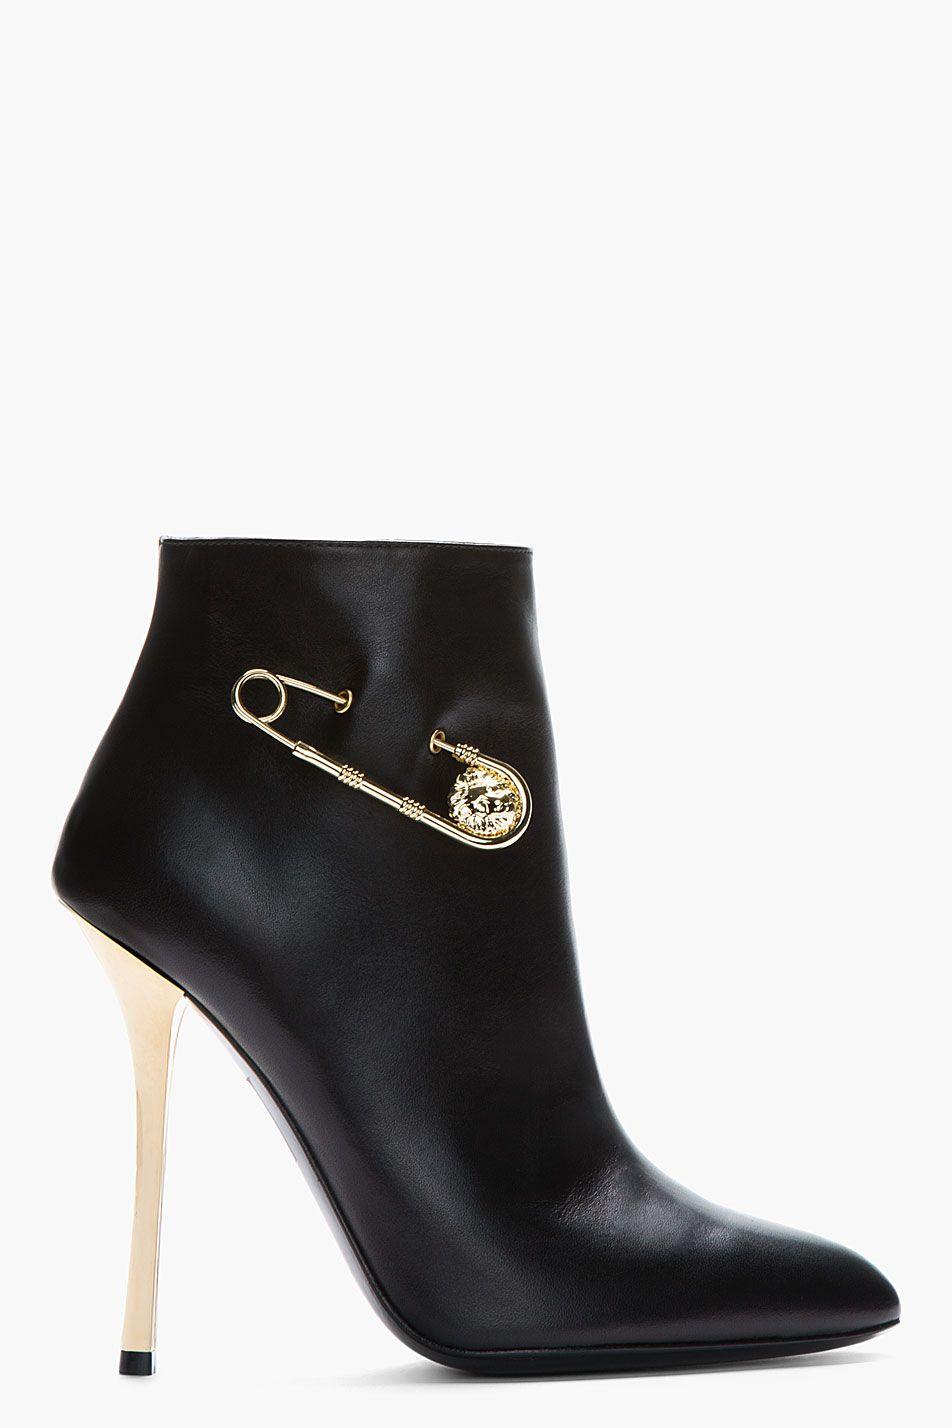 Fernanda Pin En BotasBottes Chaussure De FemmeChaussures Y Maria Yybf6g7